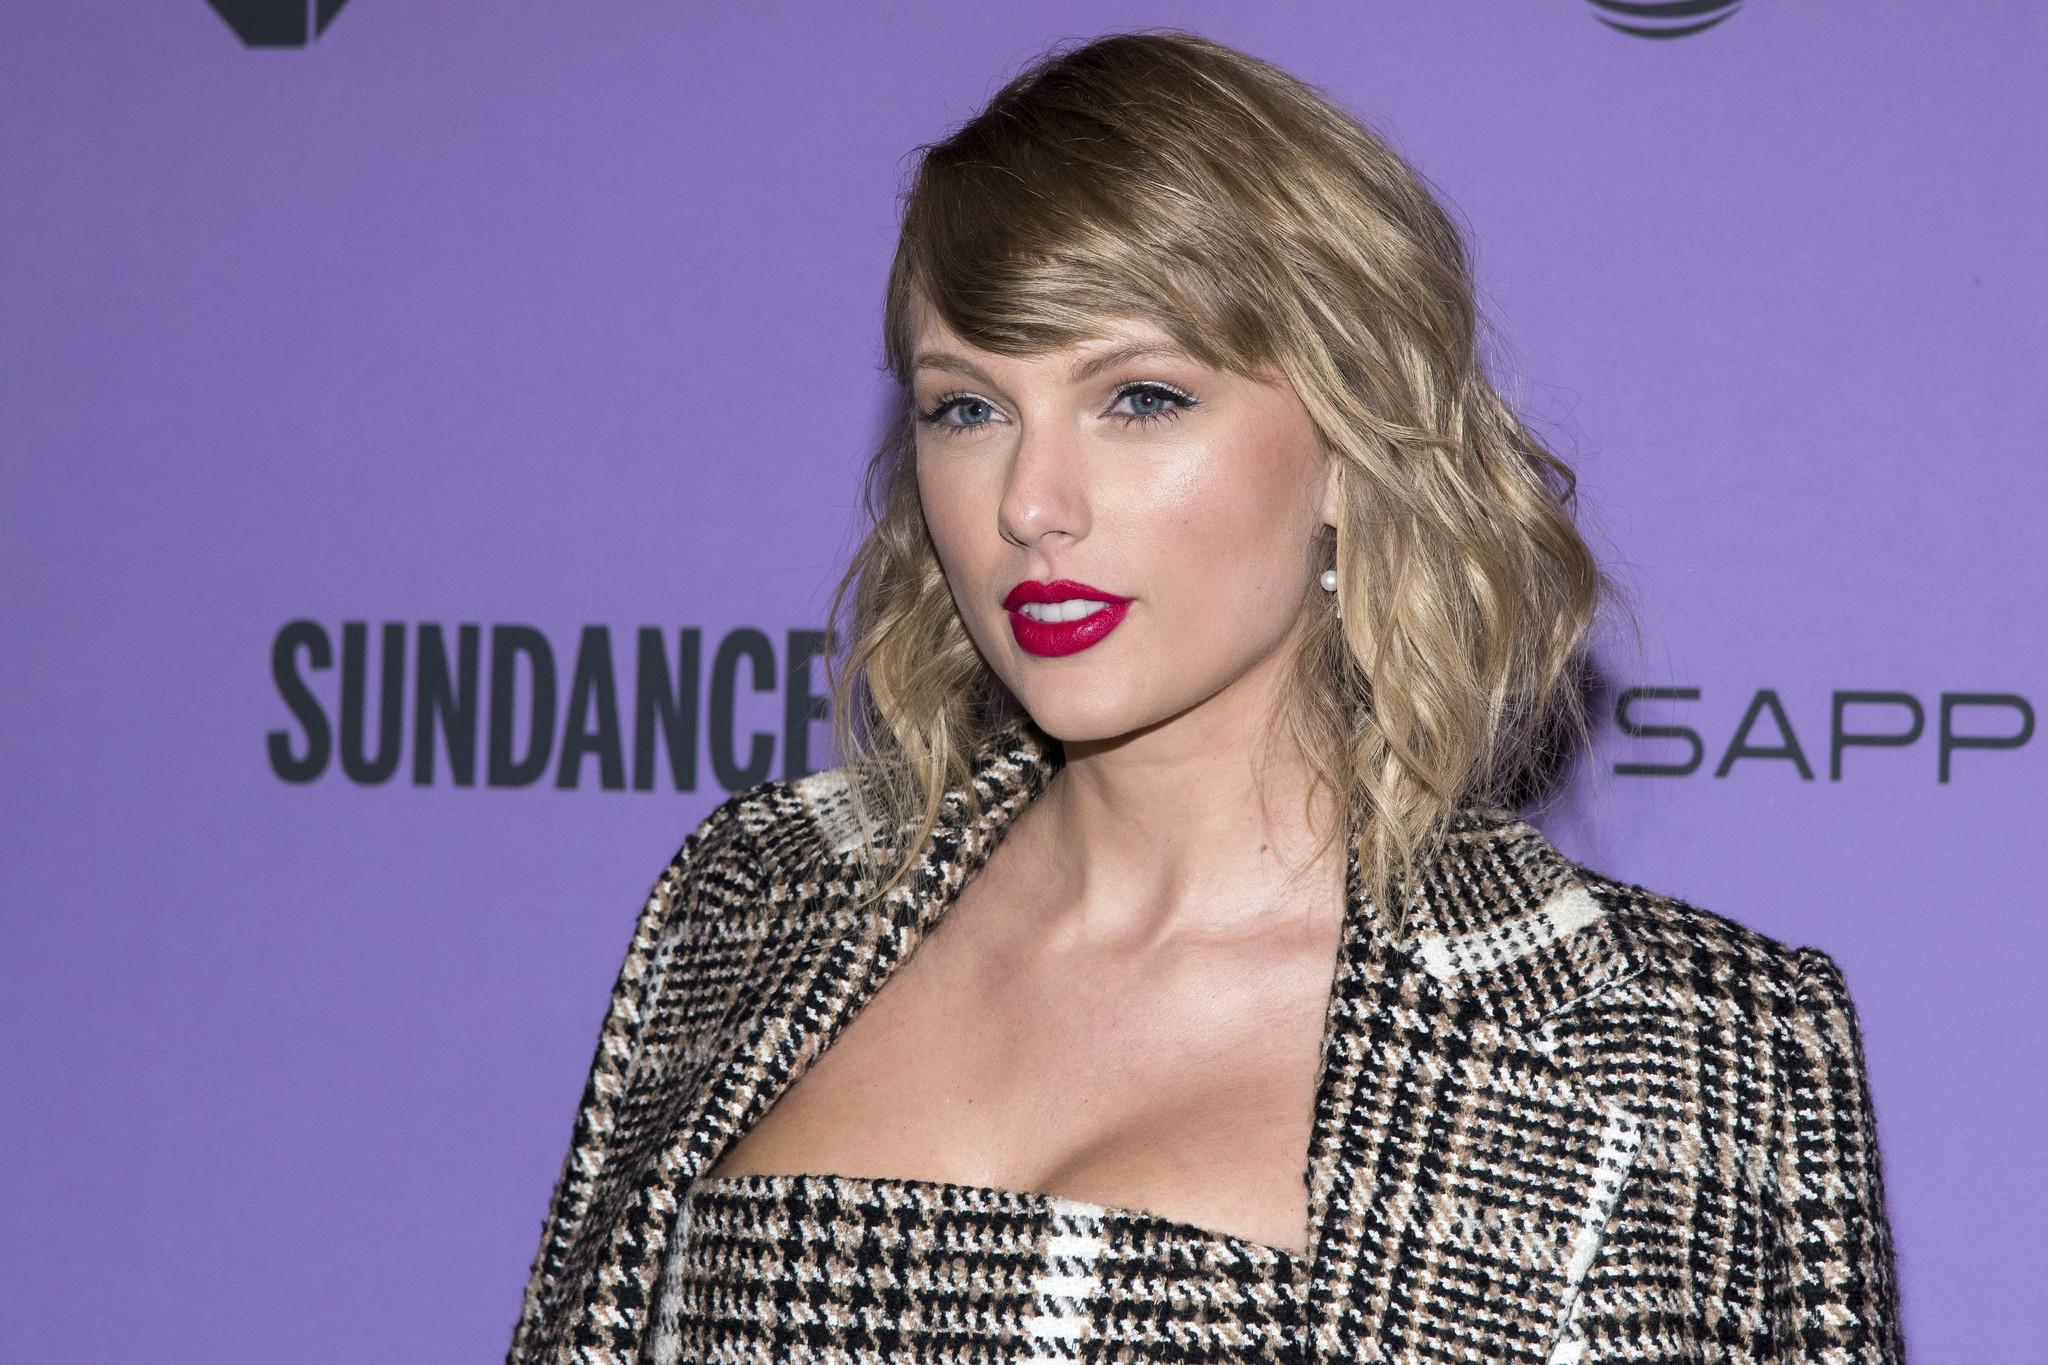 Taylor Swift donates cash to help Nashville record store through coronavirus pandemic